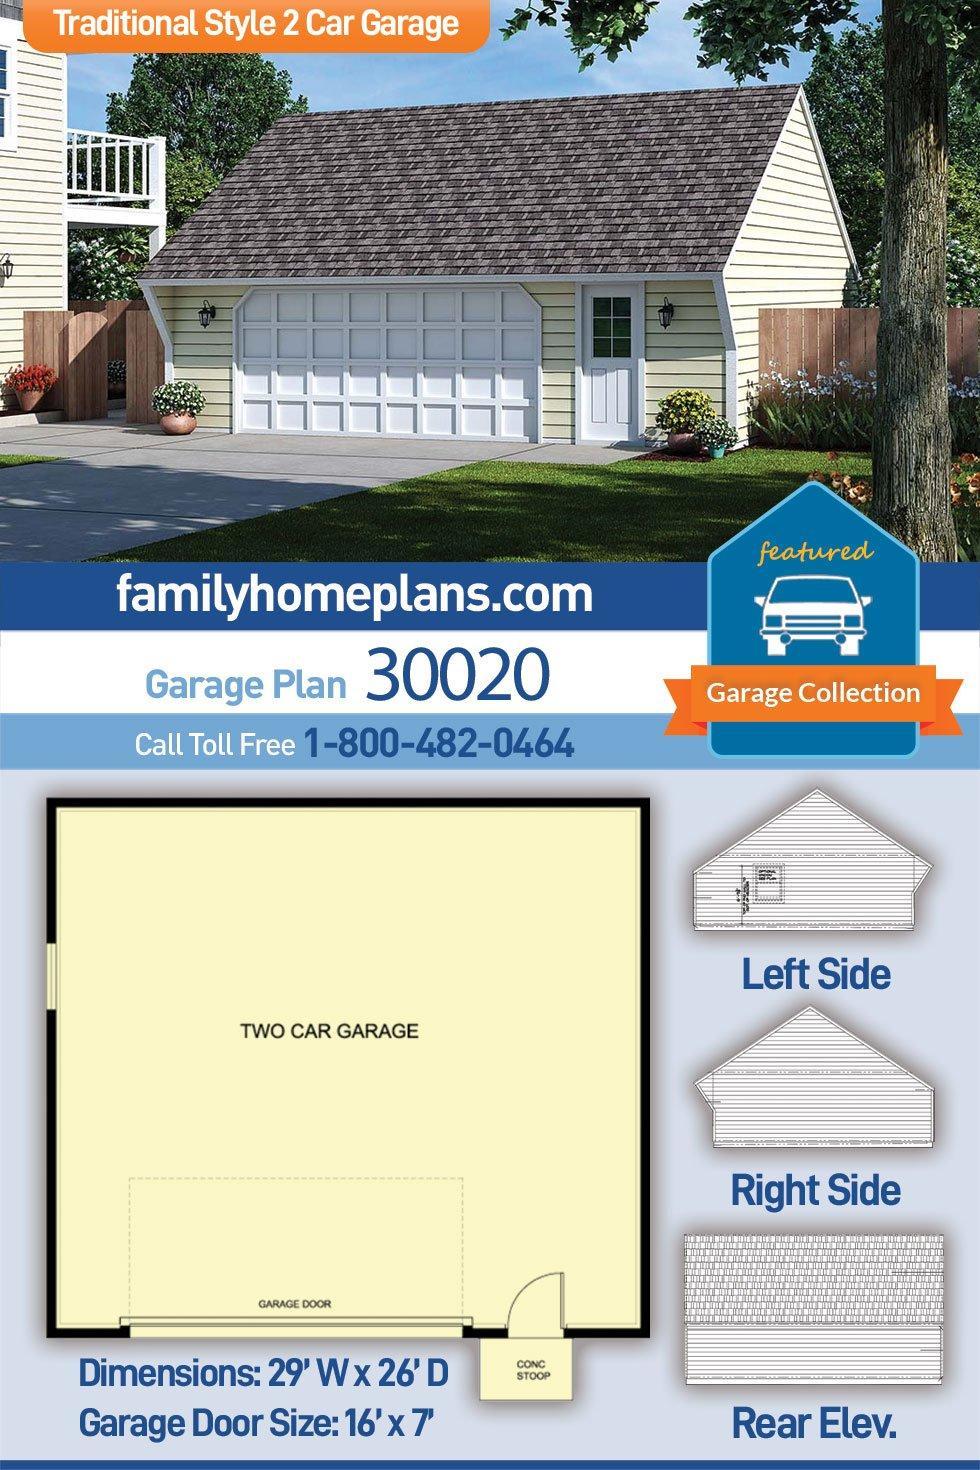 Cape Cod, Saltbox, Traditional 2 Car Garage Plan 30020